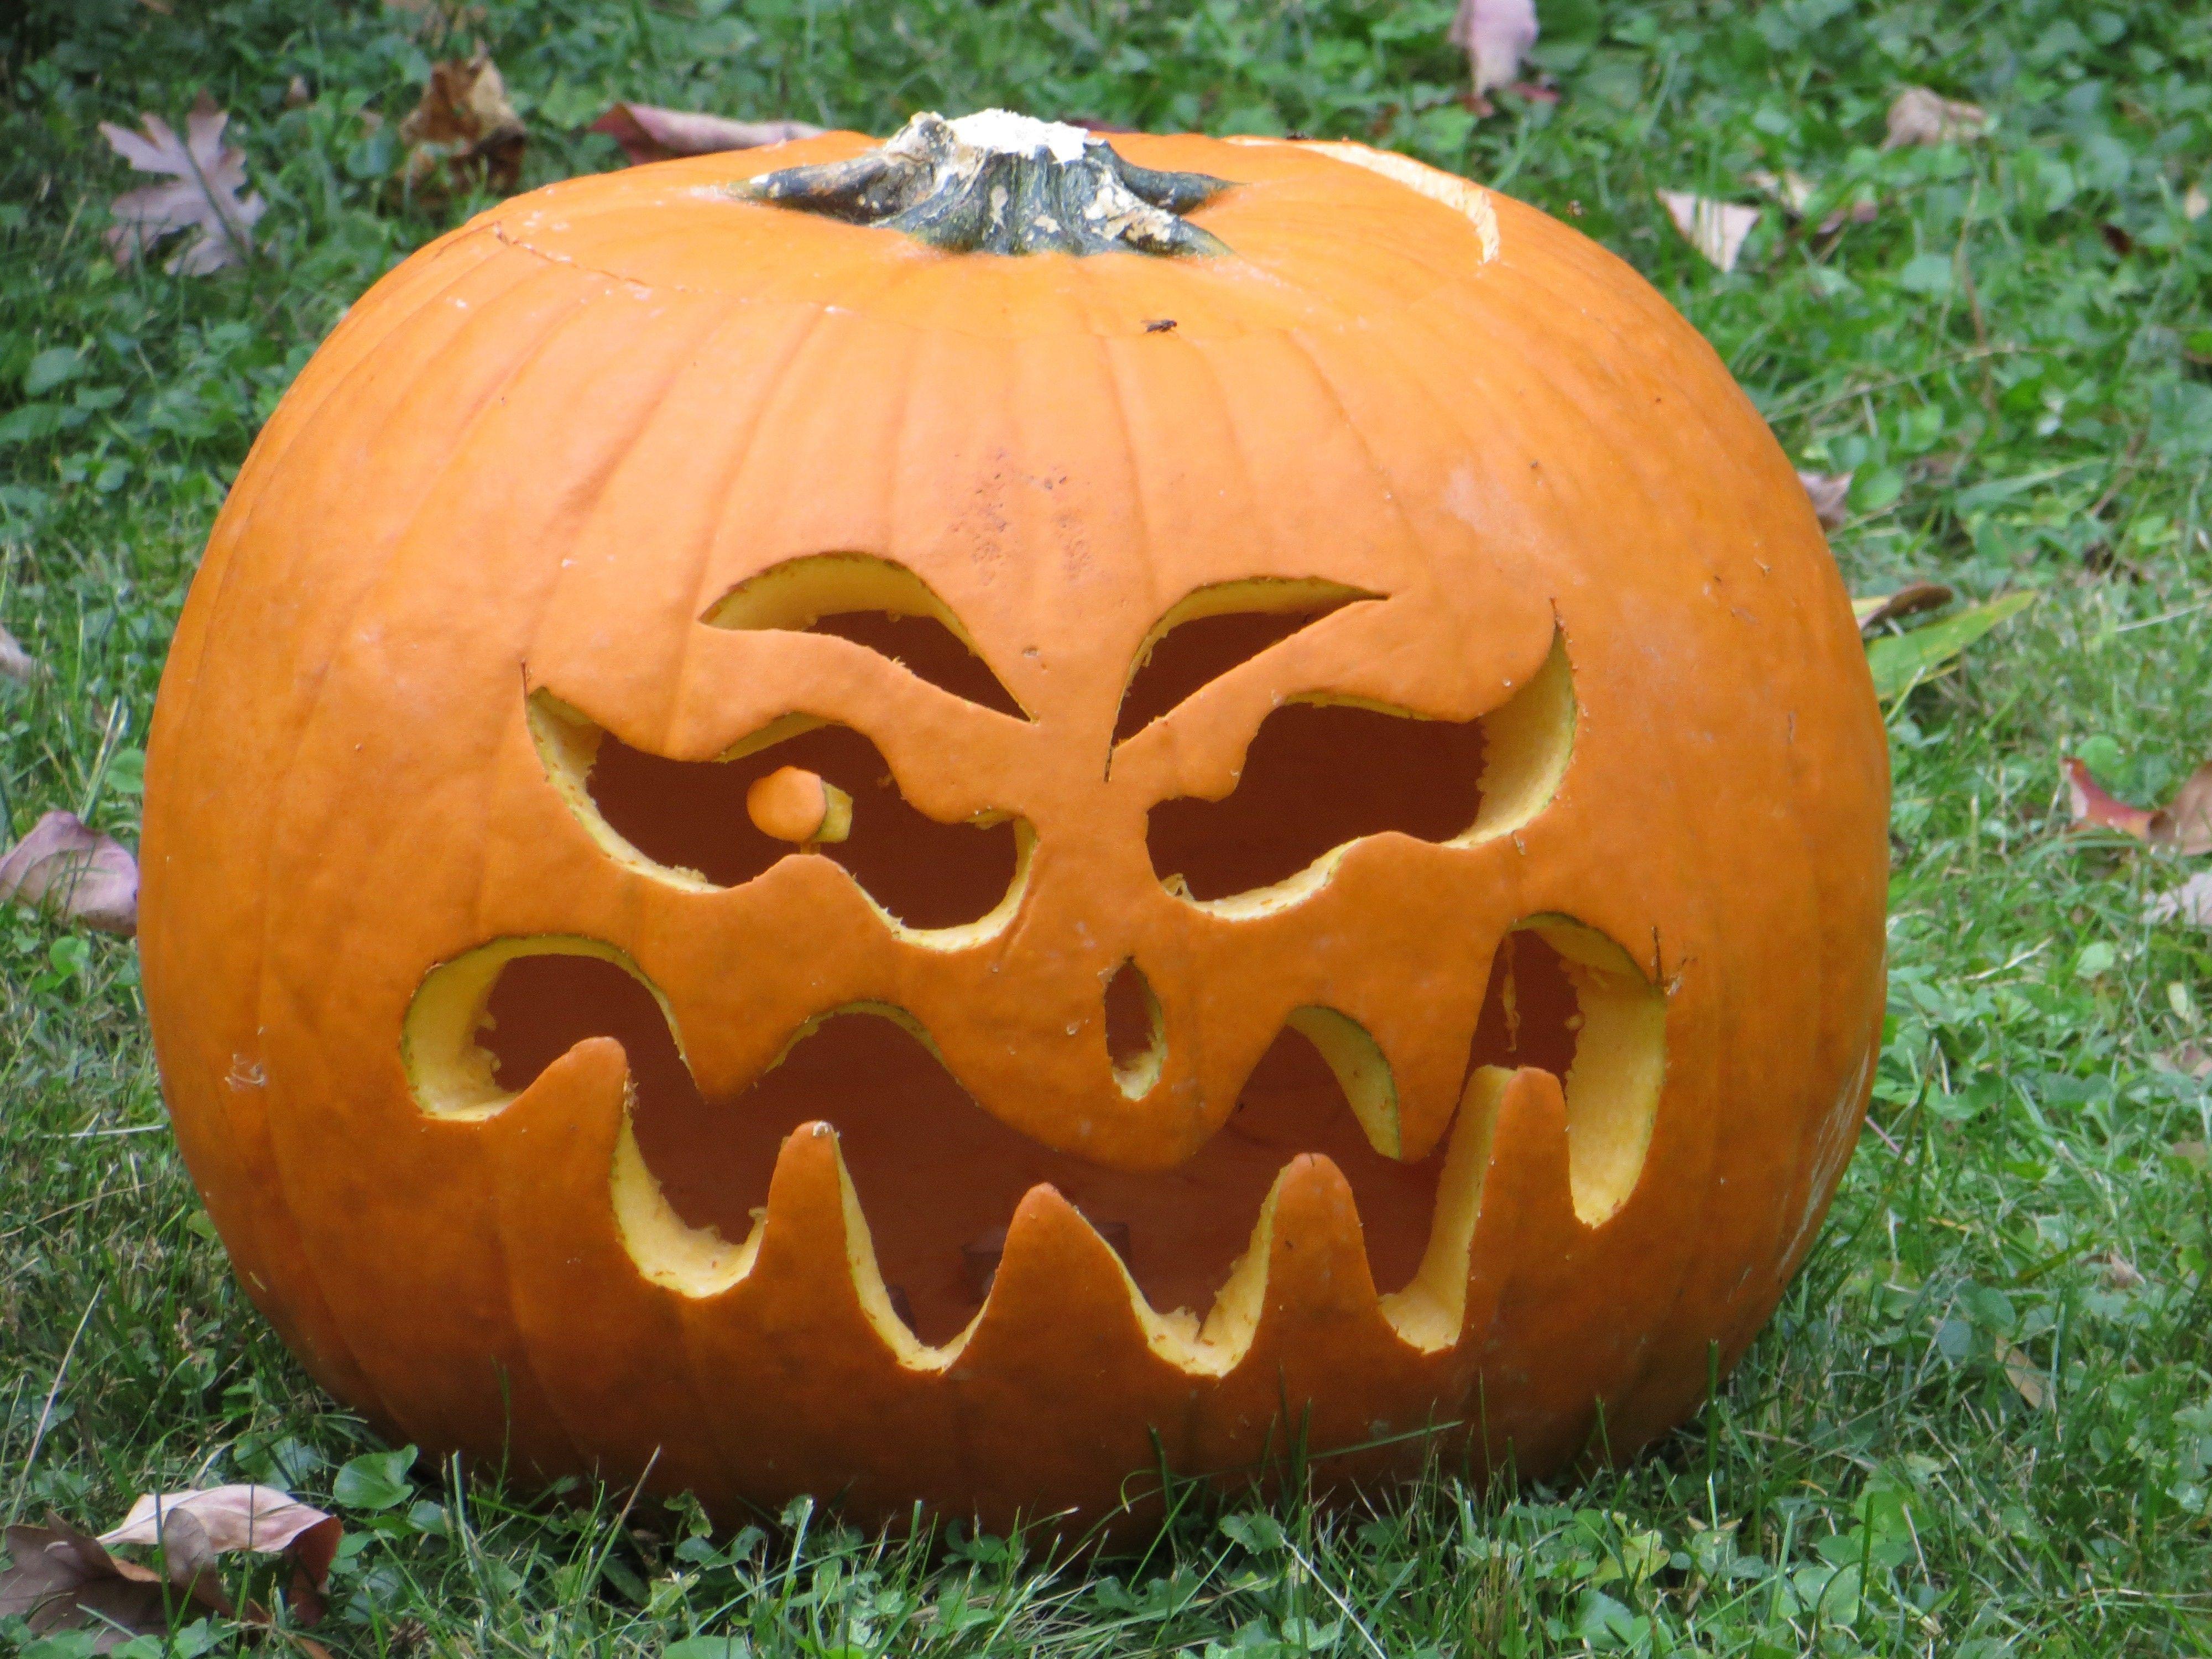 Squiggly Pumpkin Photo By Frederick Meekins Scary Pumpkin Carving Pumpkin Carving Designs Halloween Pumpkin Diy